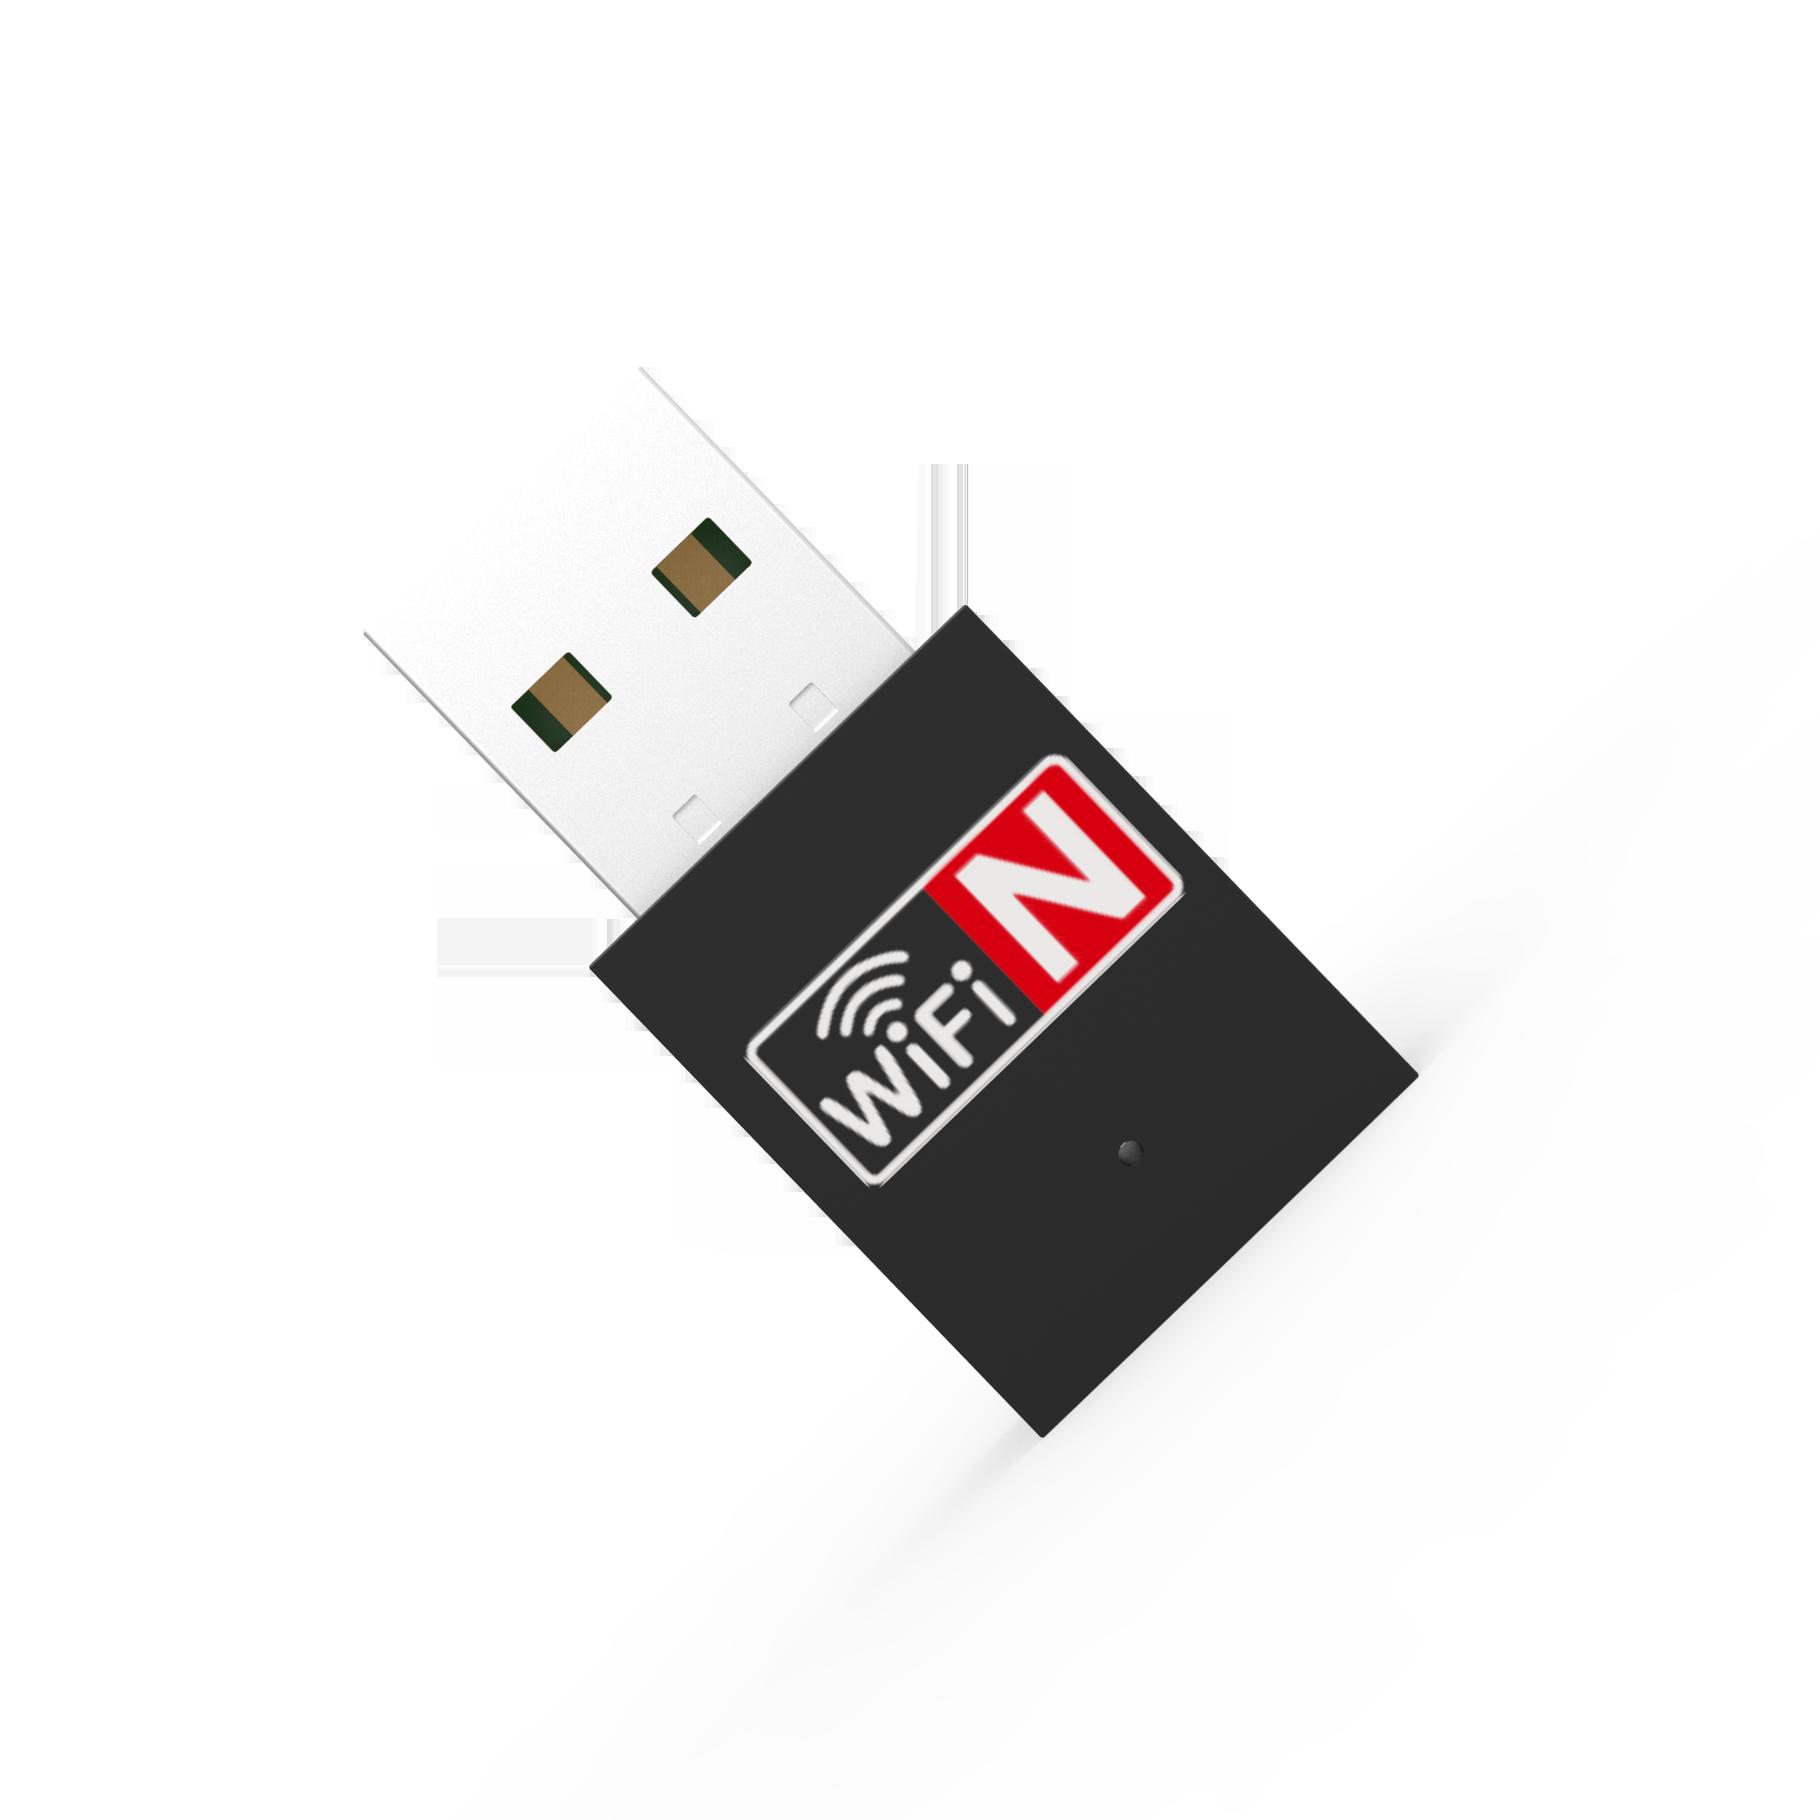 LV-UW03 300Mbps USB2.0 WiFi Adapter